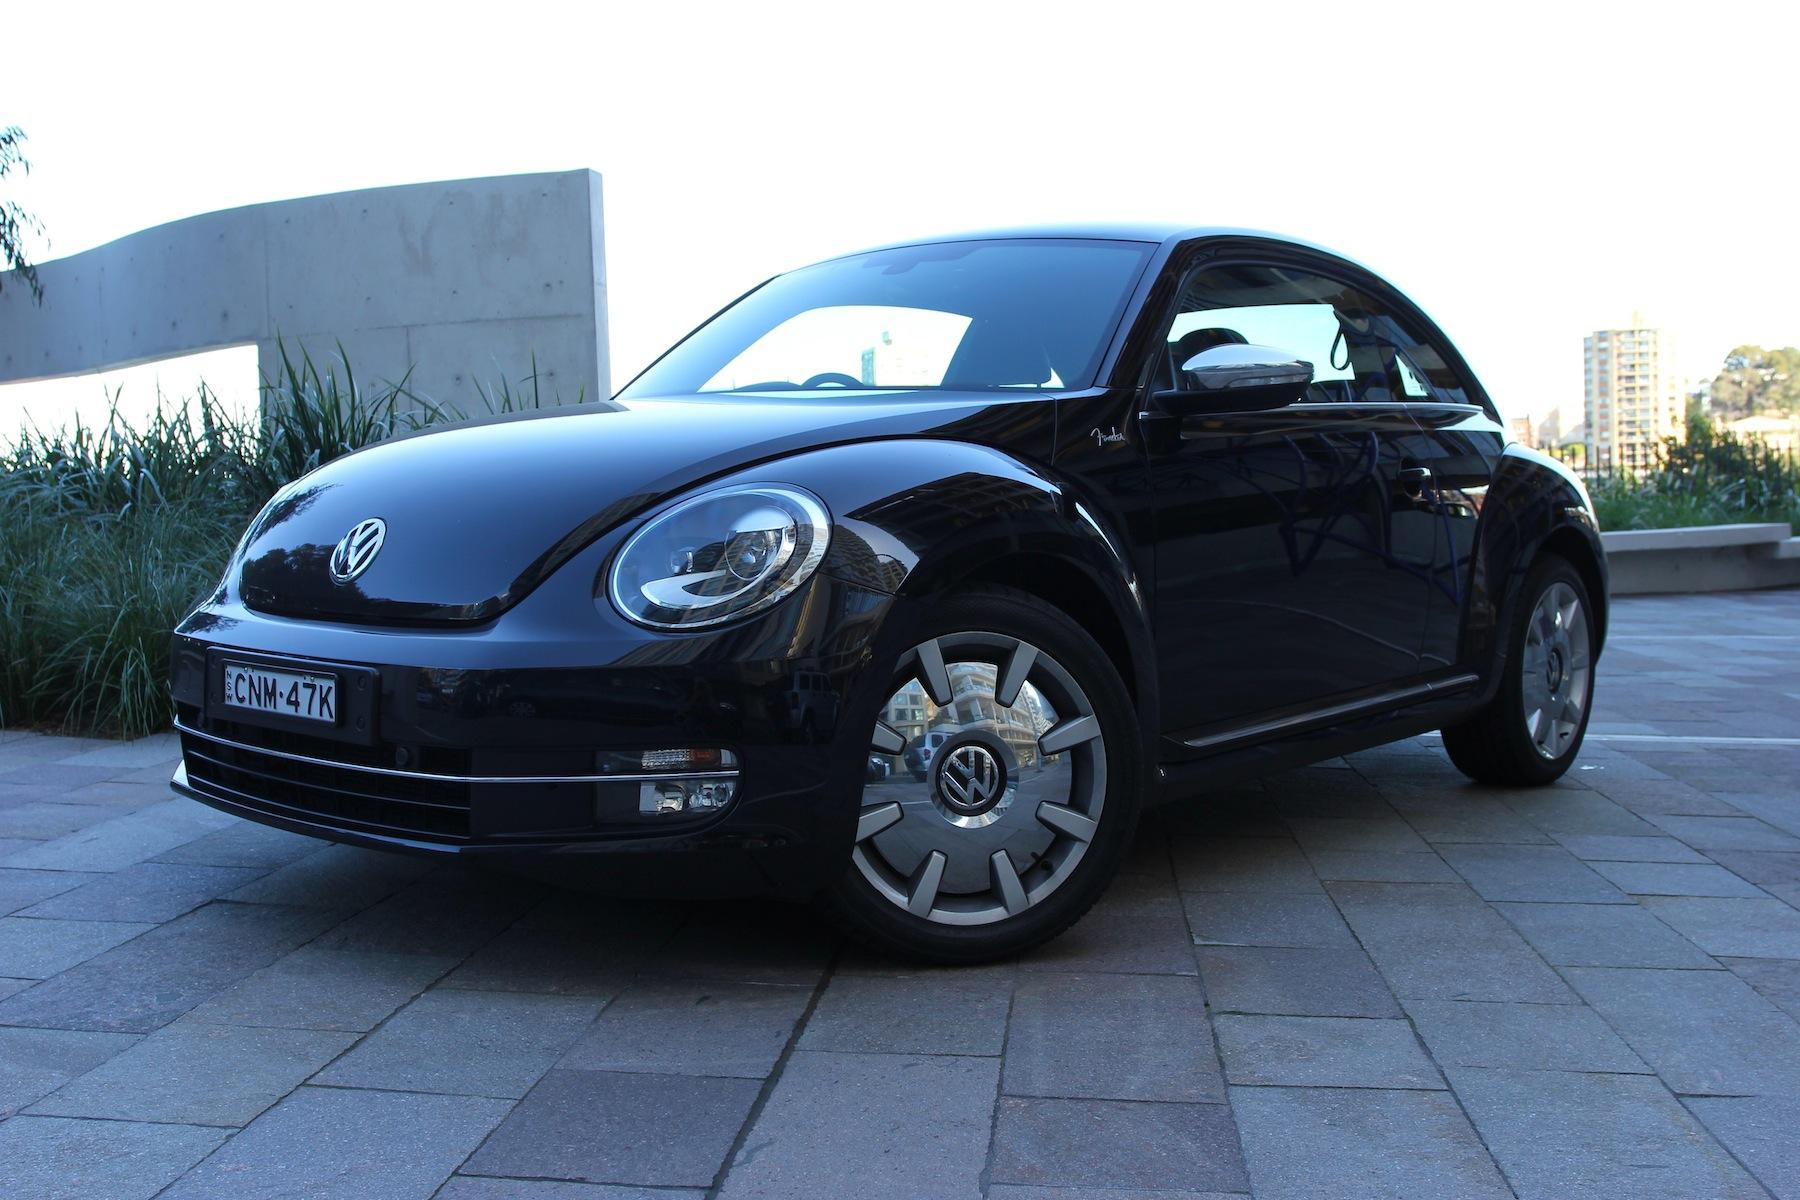 volkswagen beetle review fender edition caradvice. Black Bedroom Furniture Sets. Home Design Ideas